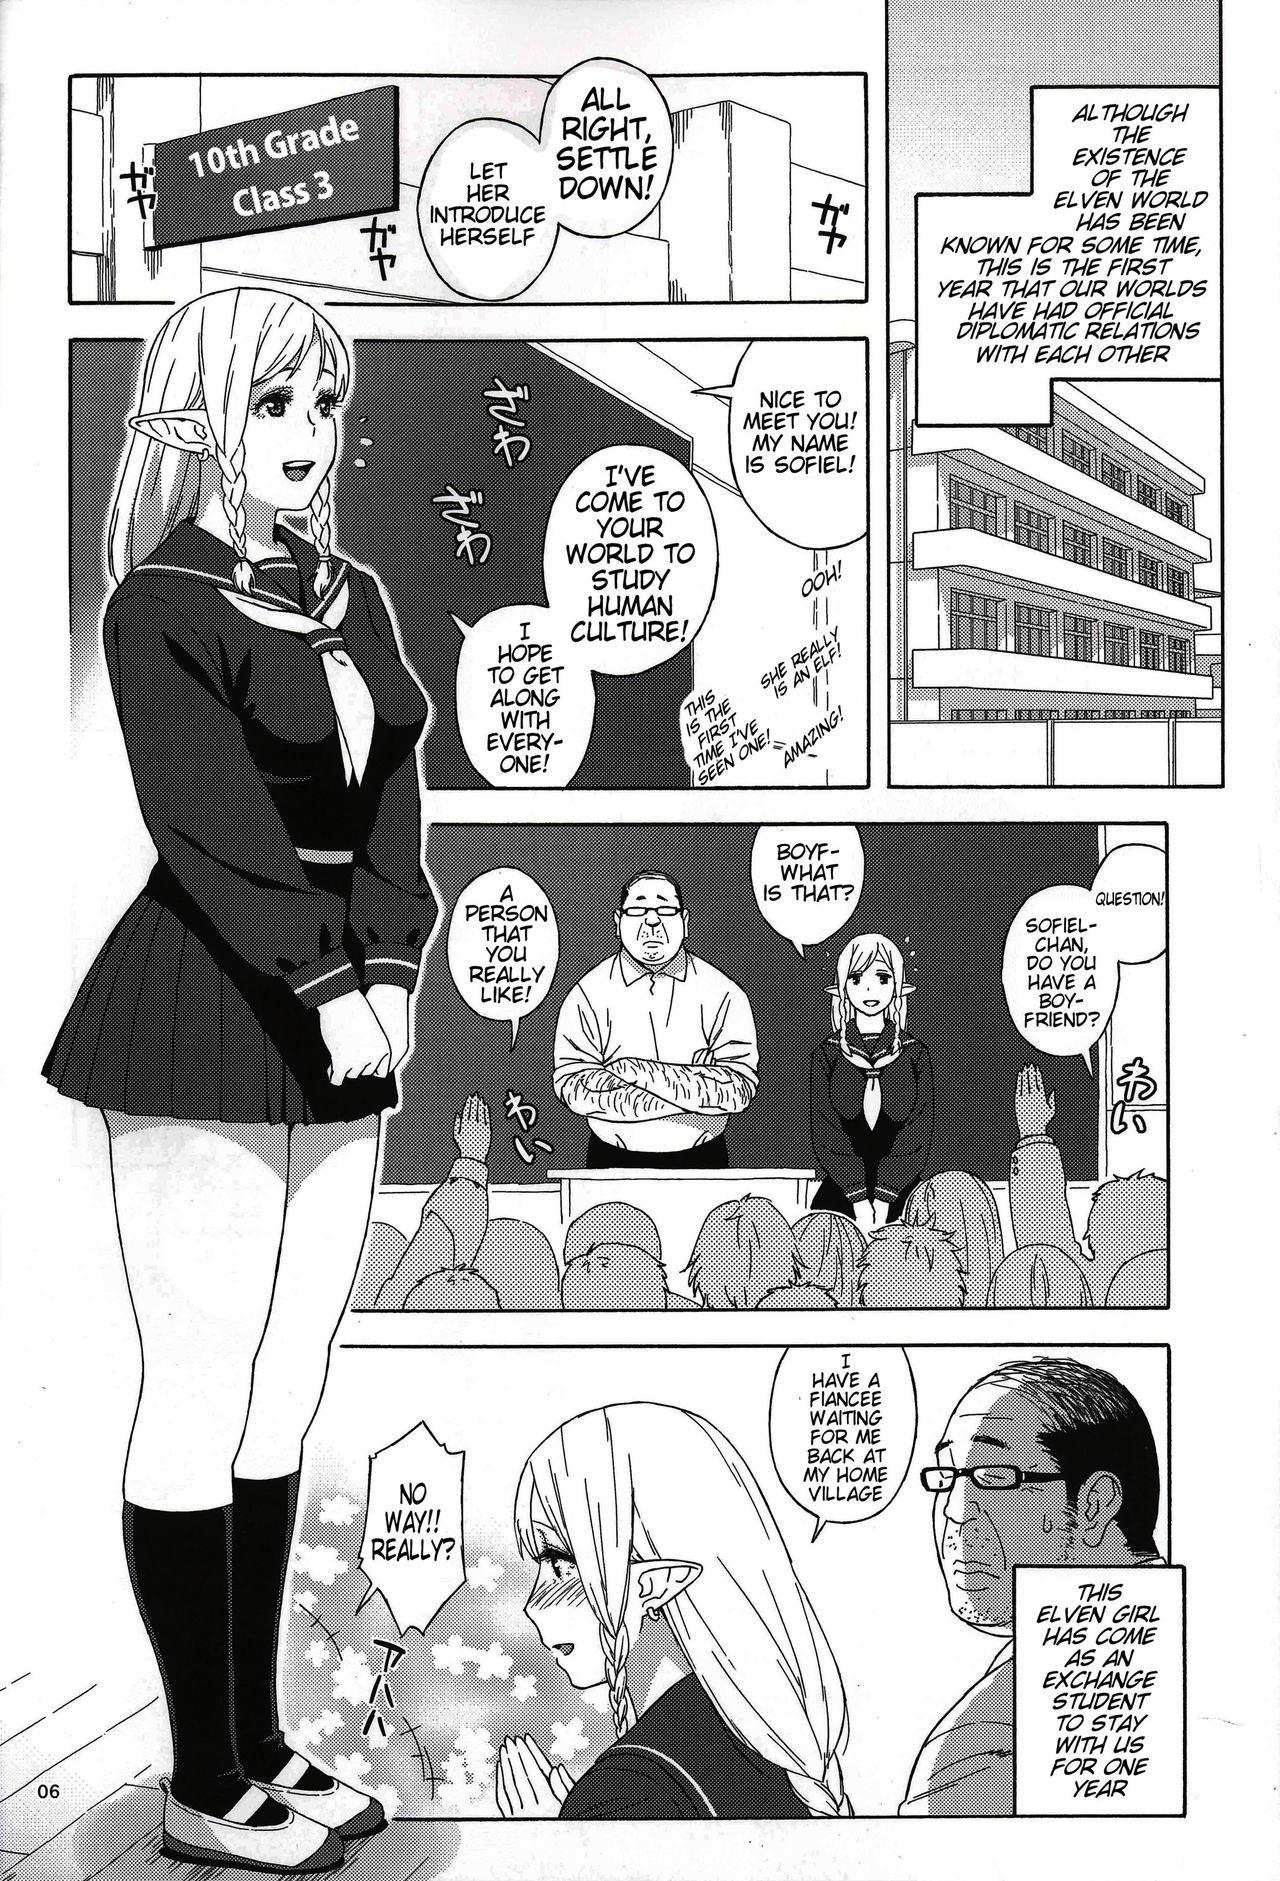 (C89) [666PROTECT (Jingrock)] Tenkousei JK Elf -Houkago Choukyou Jugyou- | High School Elven Transfer Student -After School Sex Training Lessons- [English] [Tremalkinger] 5